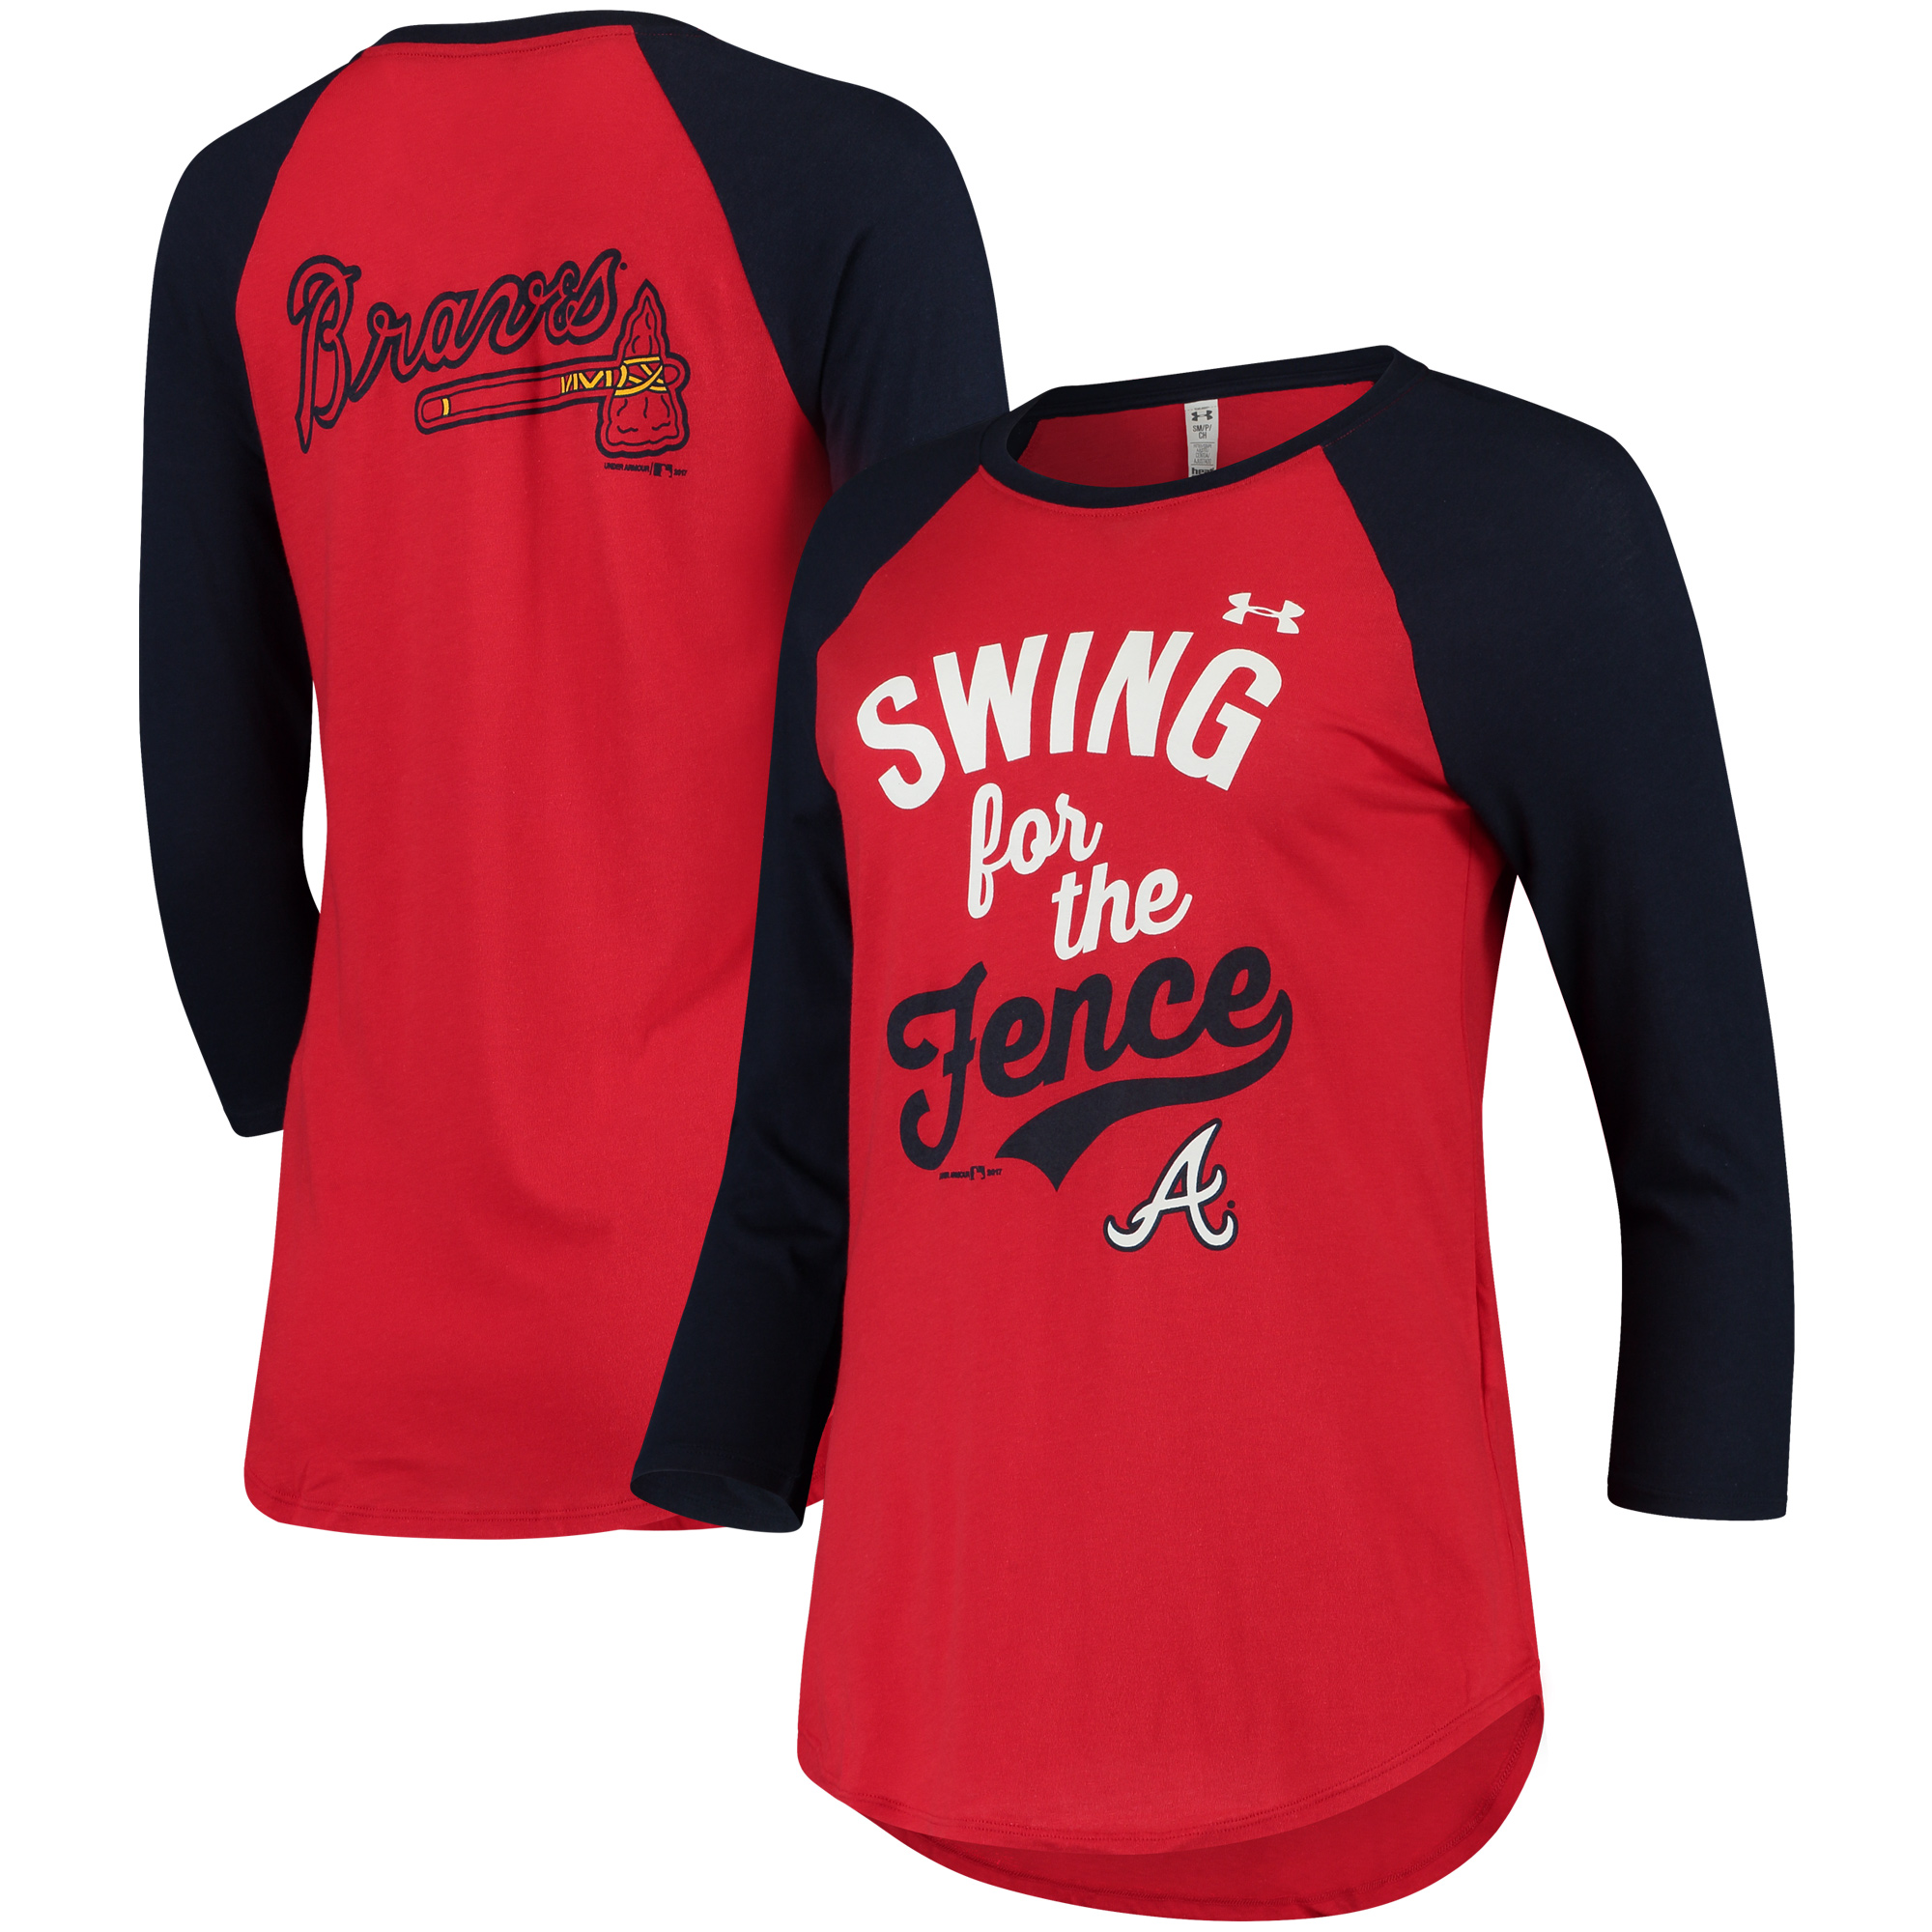 Atlanta Braves Under Armour Women's Baseball 3/4-Sleeve Performance T-Shirt - Red/Navy